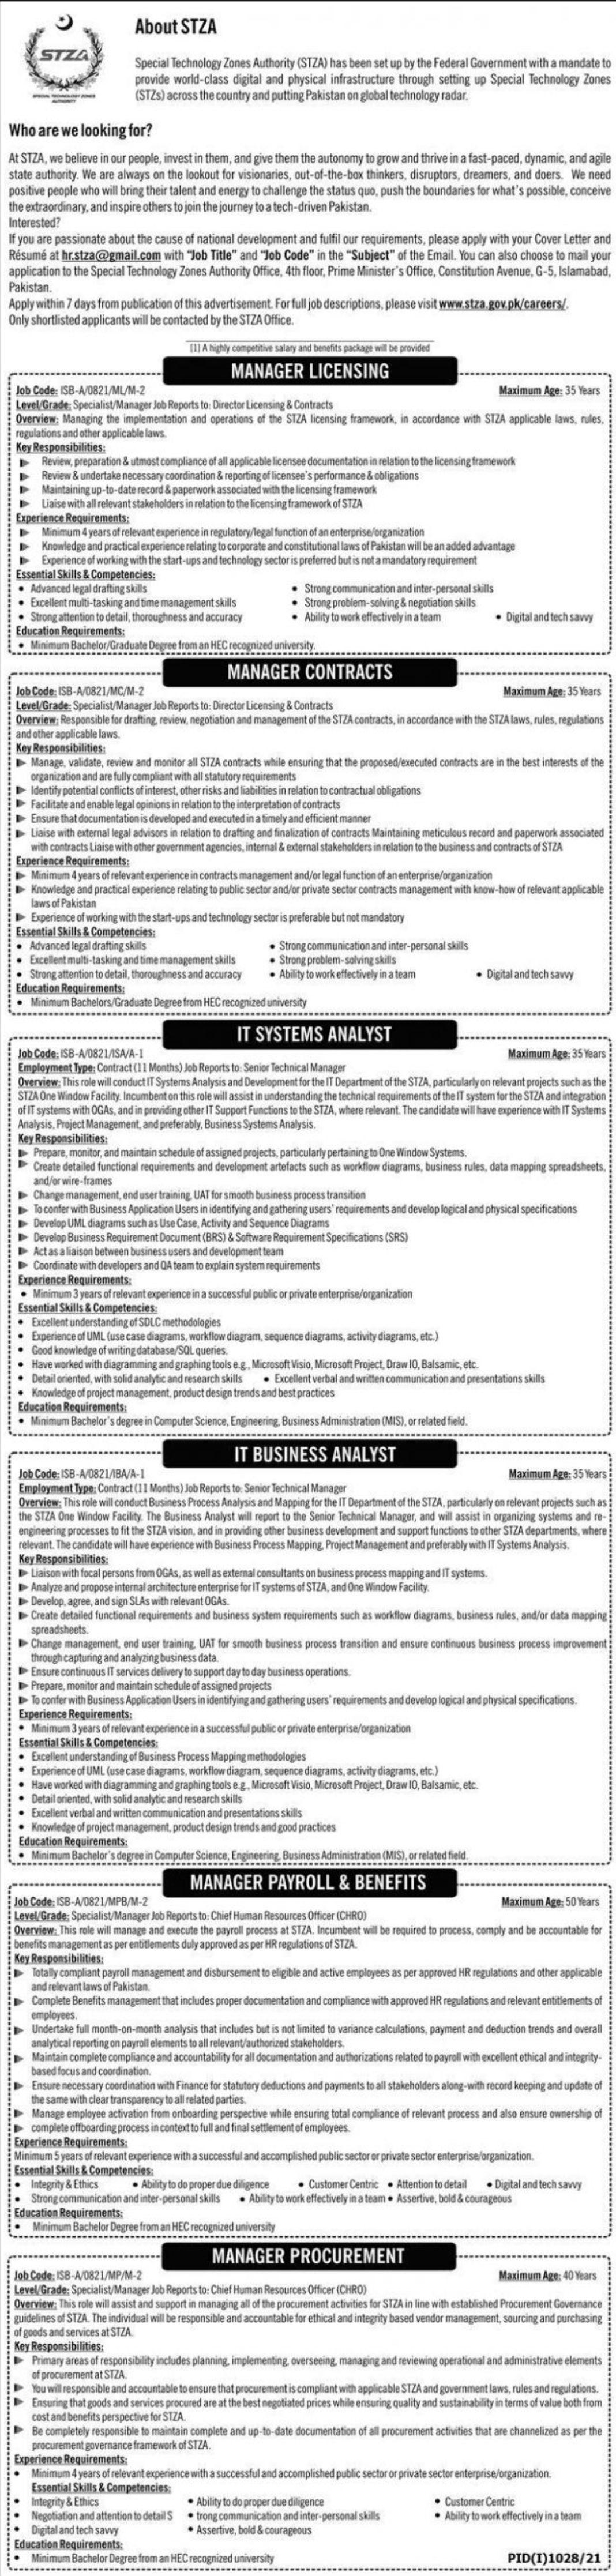 Special Technology Zones Authority Vacancies 2021 1